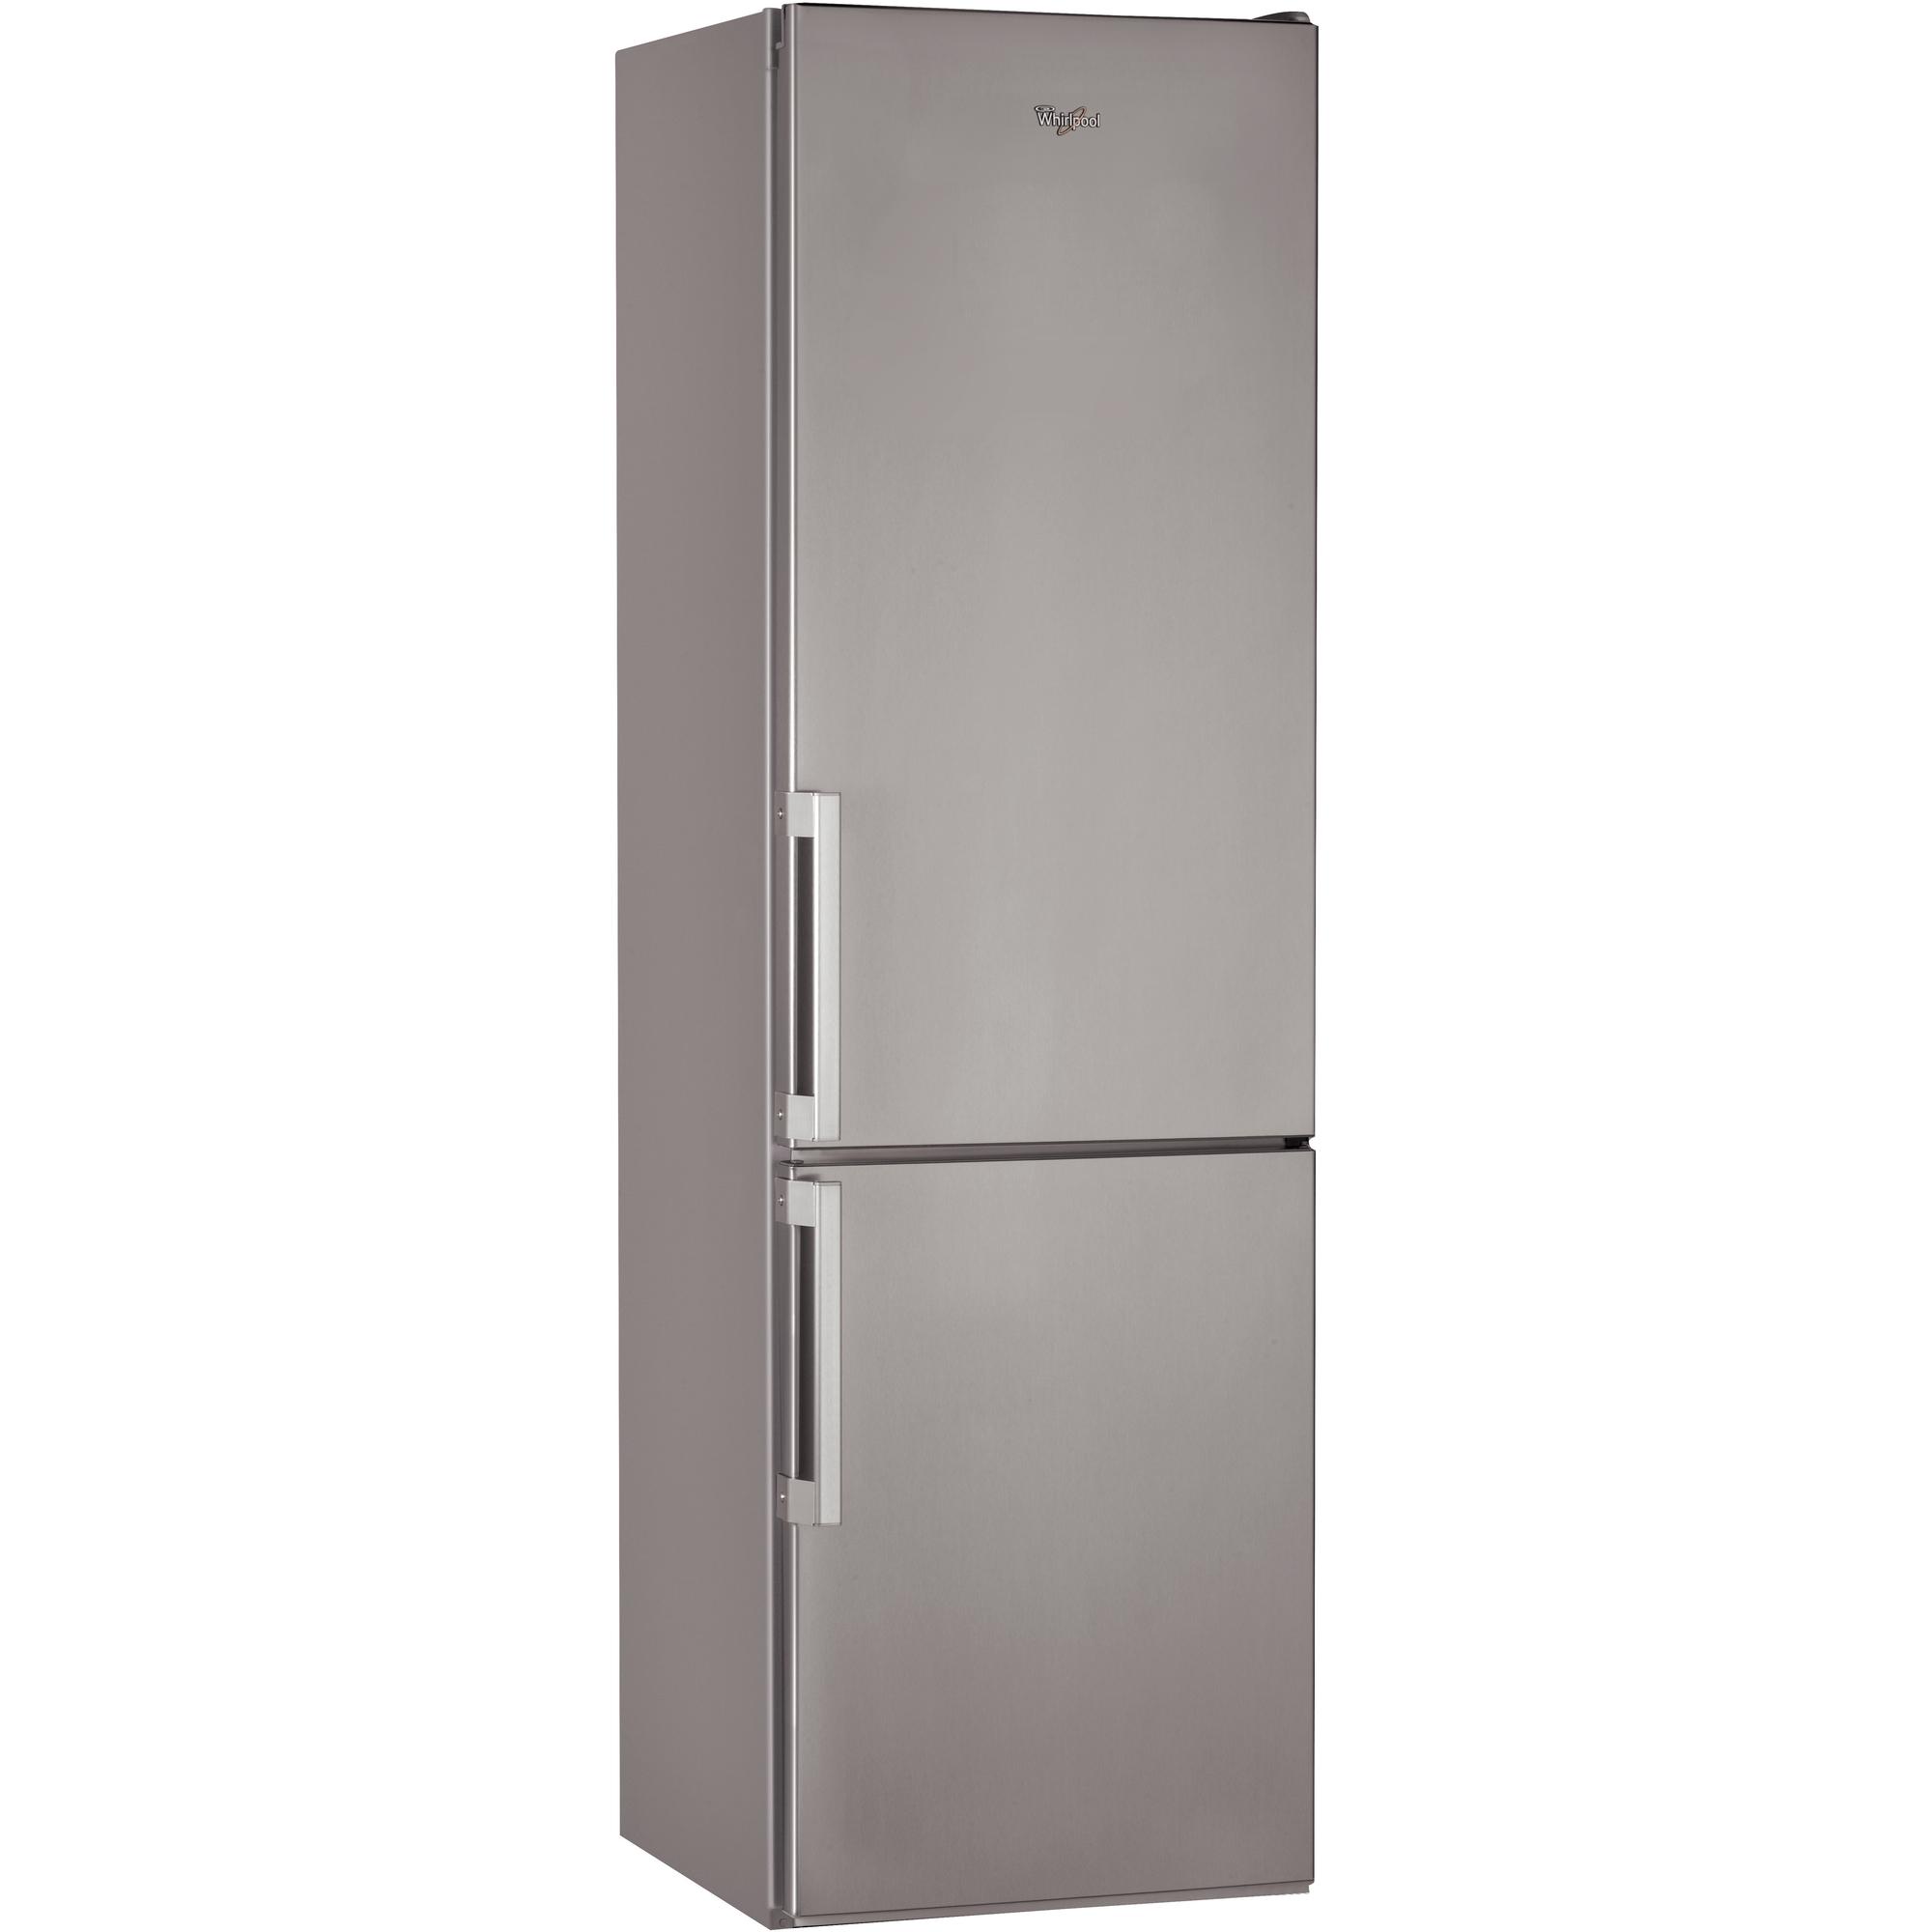 frigo whirlpool 120cm frigorifero larghezza 50cm cerca compra vendi nuovo e usato whirlpool. Black Bedroom Furniture Sets. Home Design Ideas